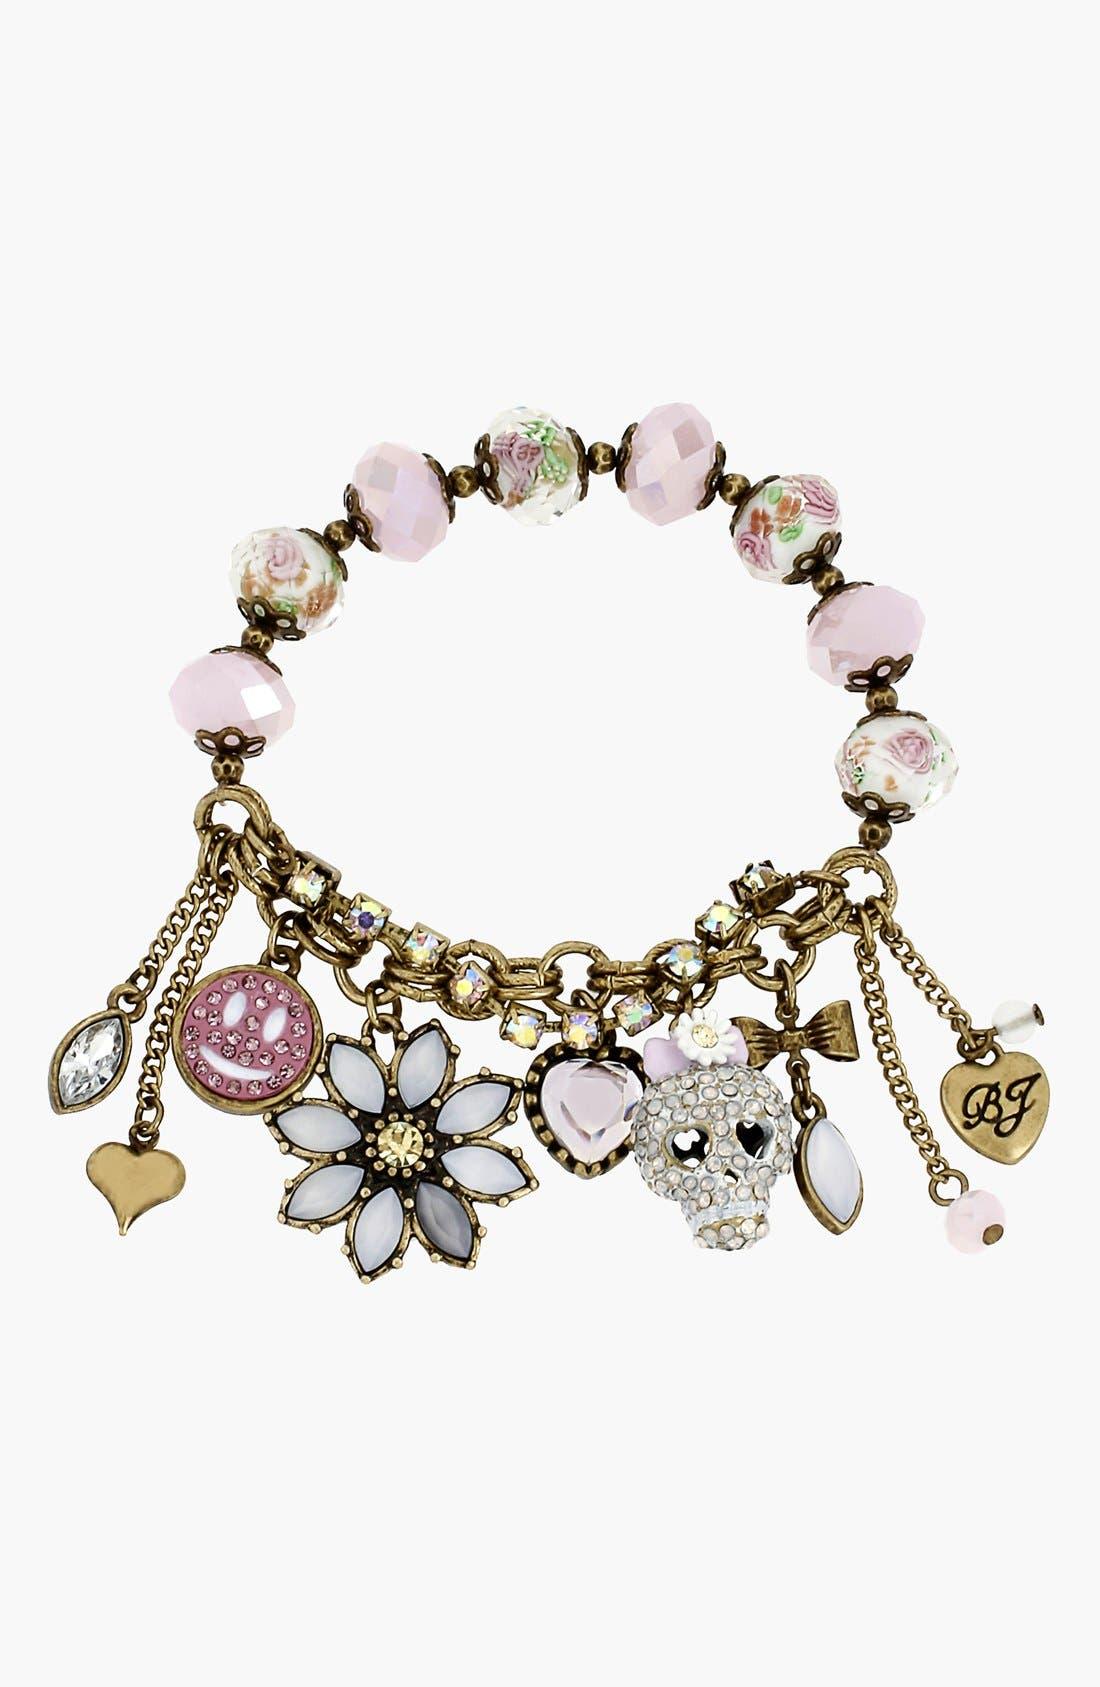 Alternate Image 1 Selected - Betsey Johnson 'Girlie Grunge' Stretch Charm Bracelet